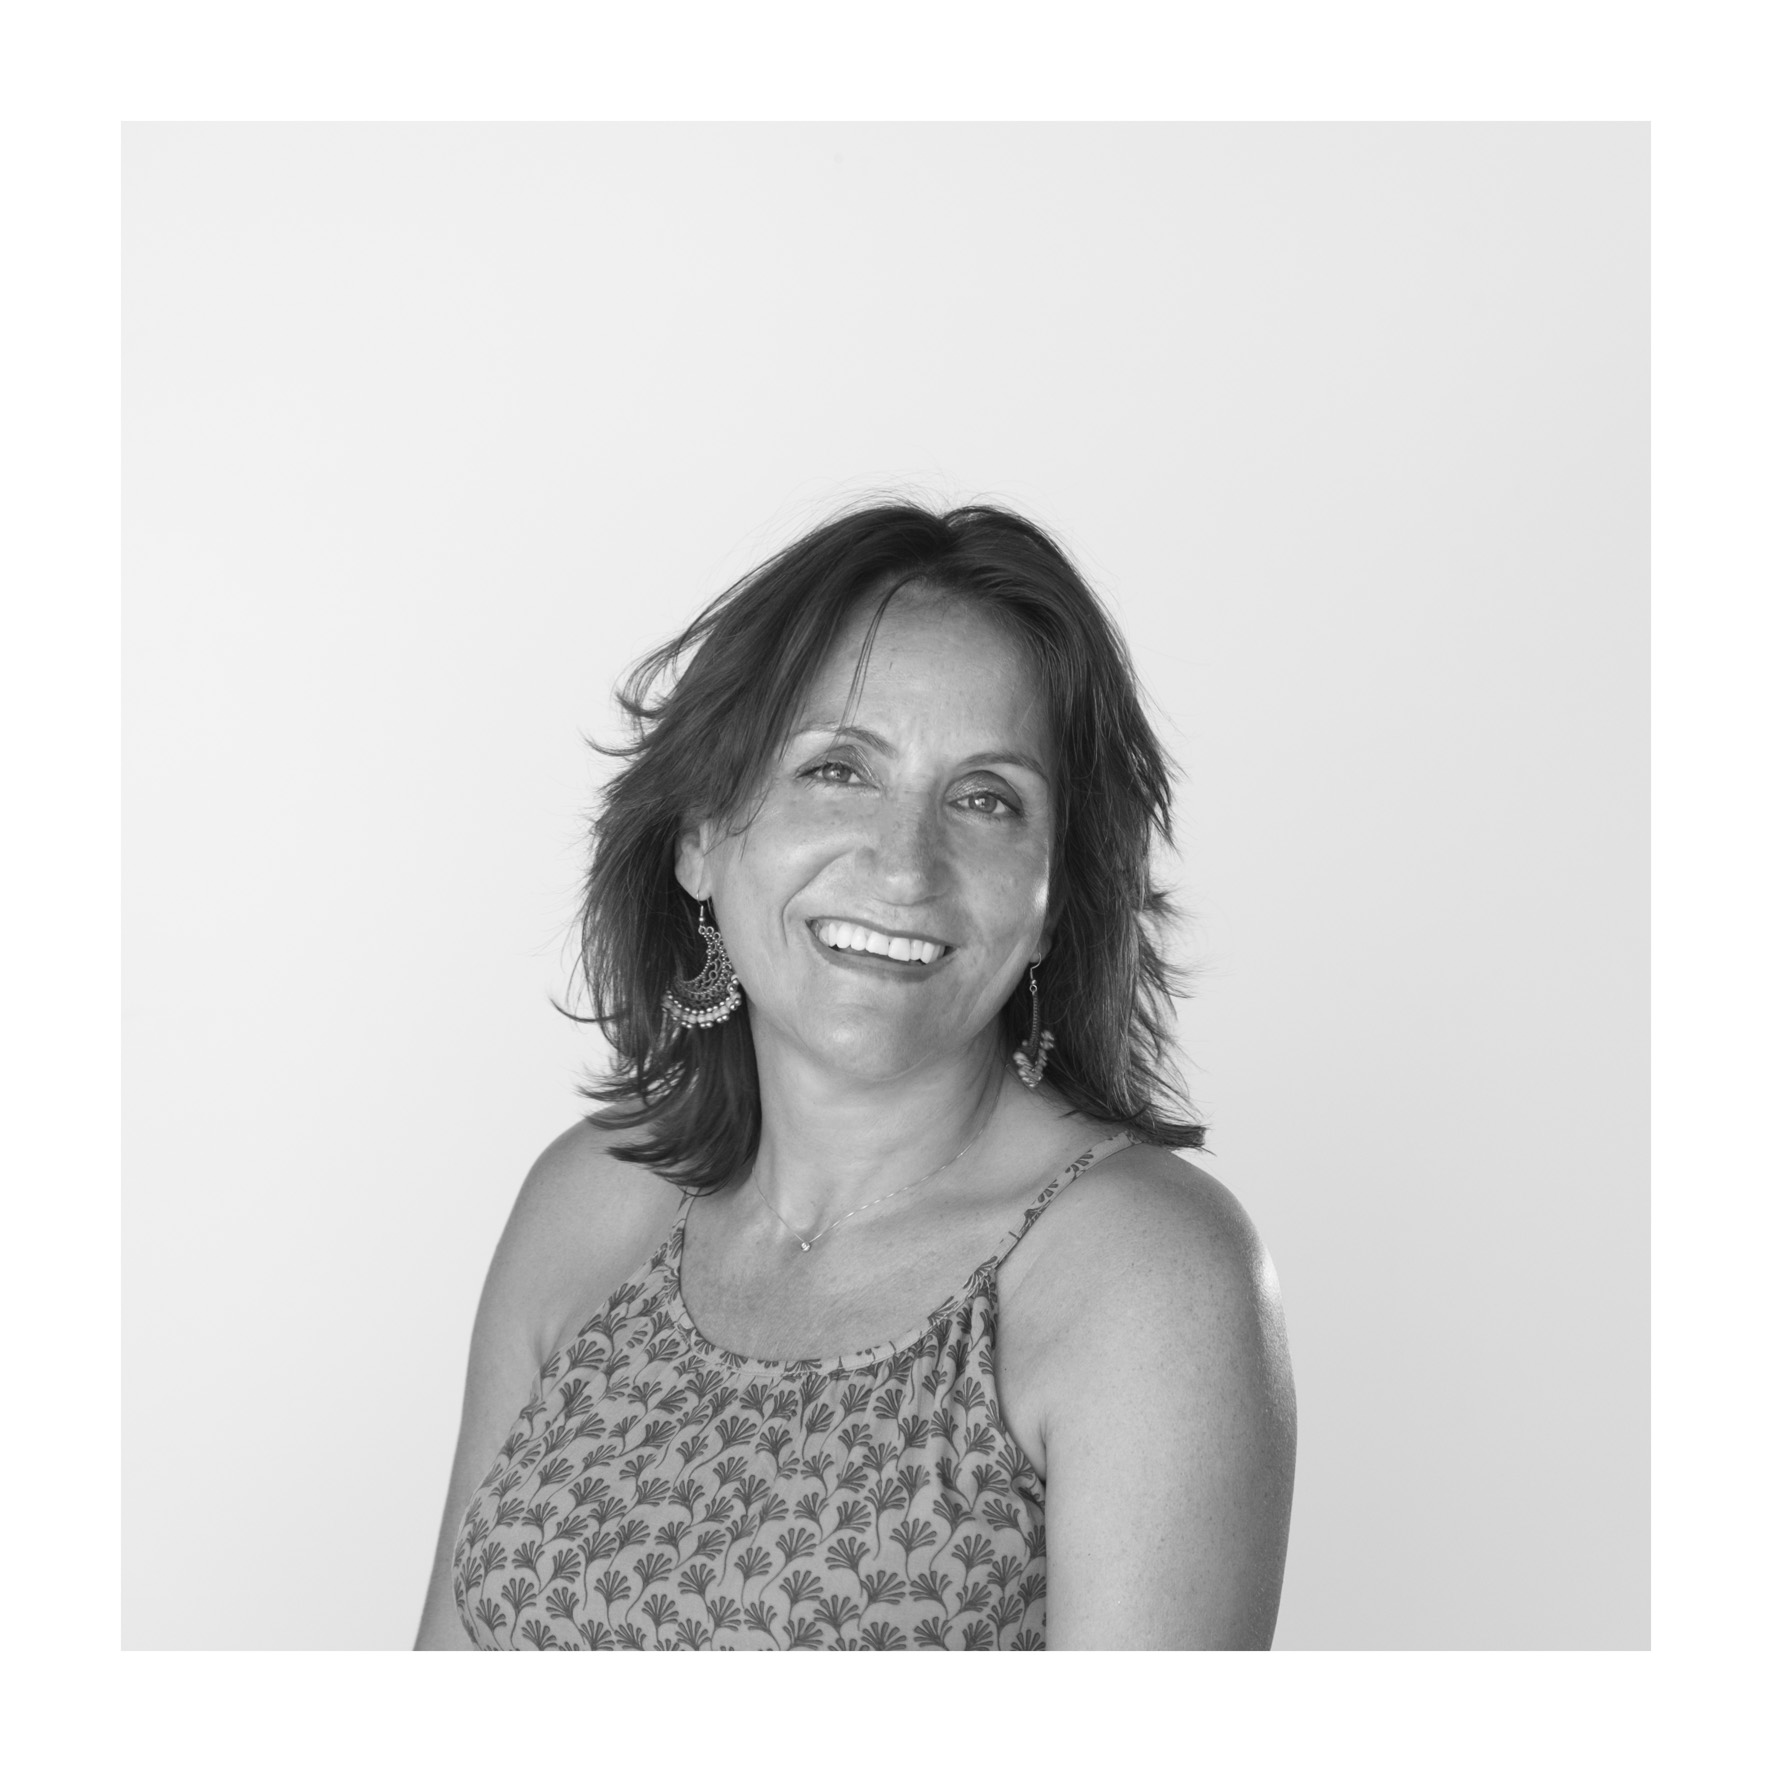 Lidia Prieto (lidia_prieto.jpg)